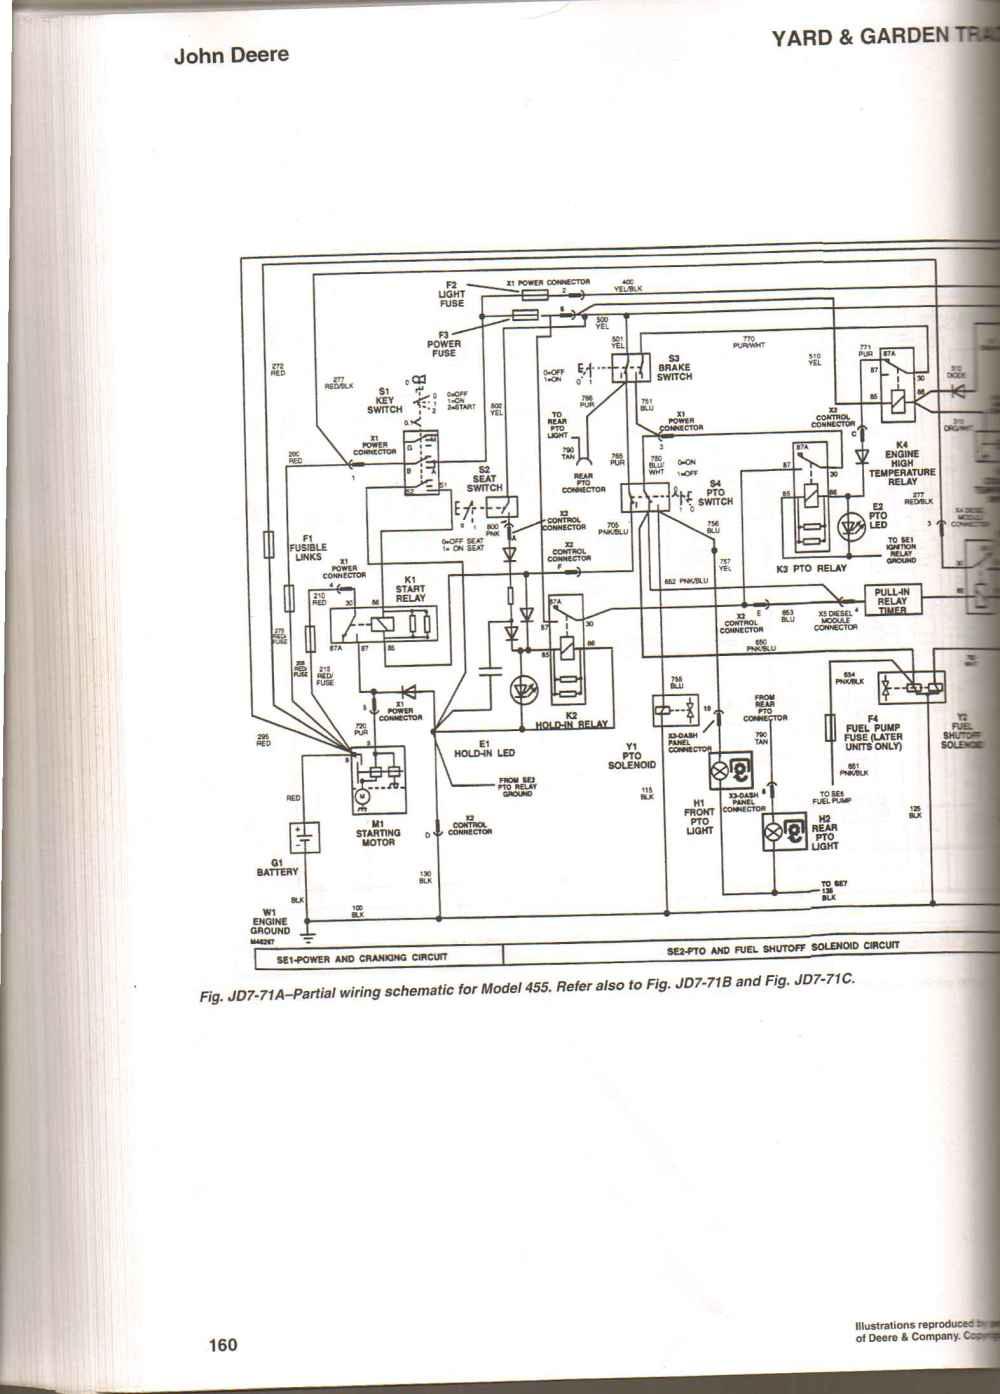 medium resolution of wiring diagram john deere lt155 15 amp john deere lt155 wiring harness